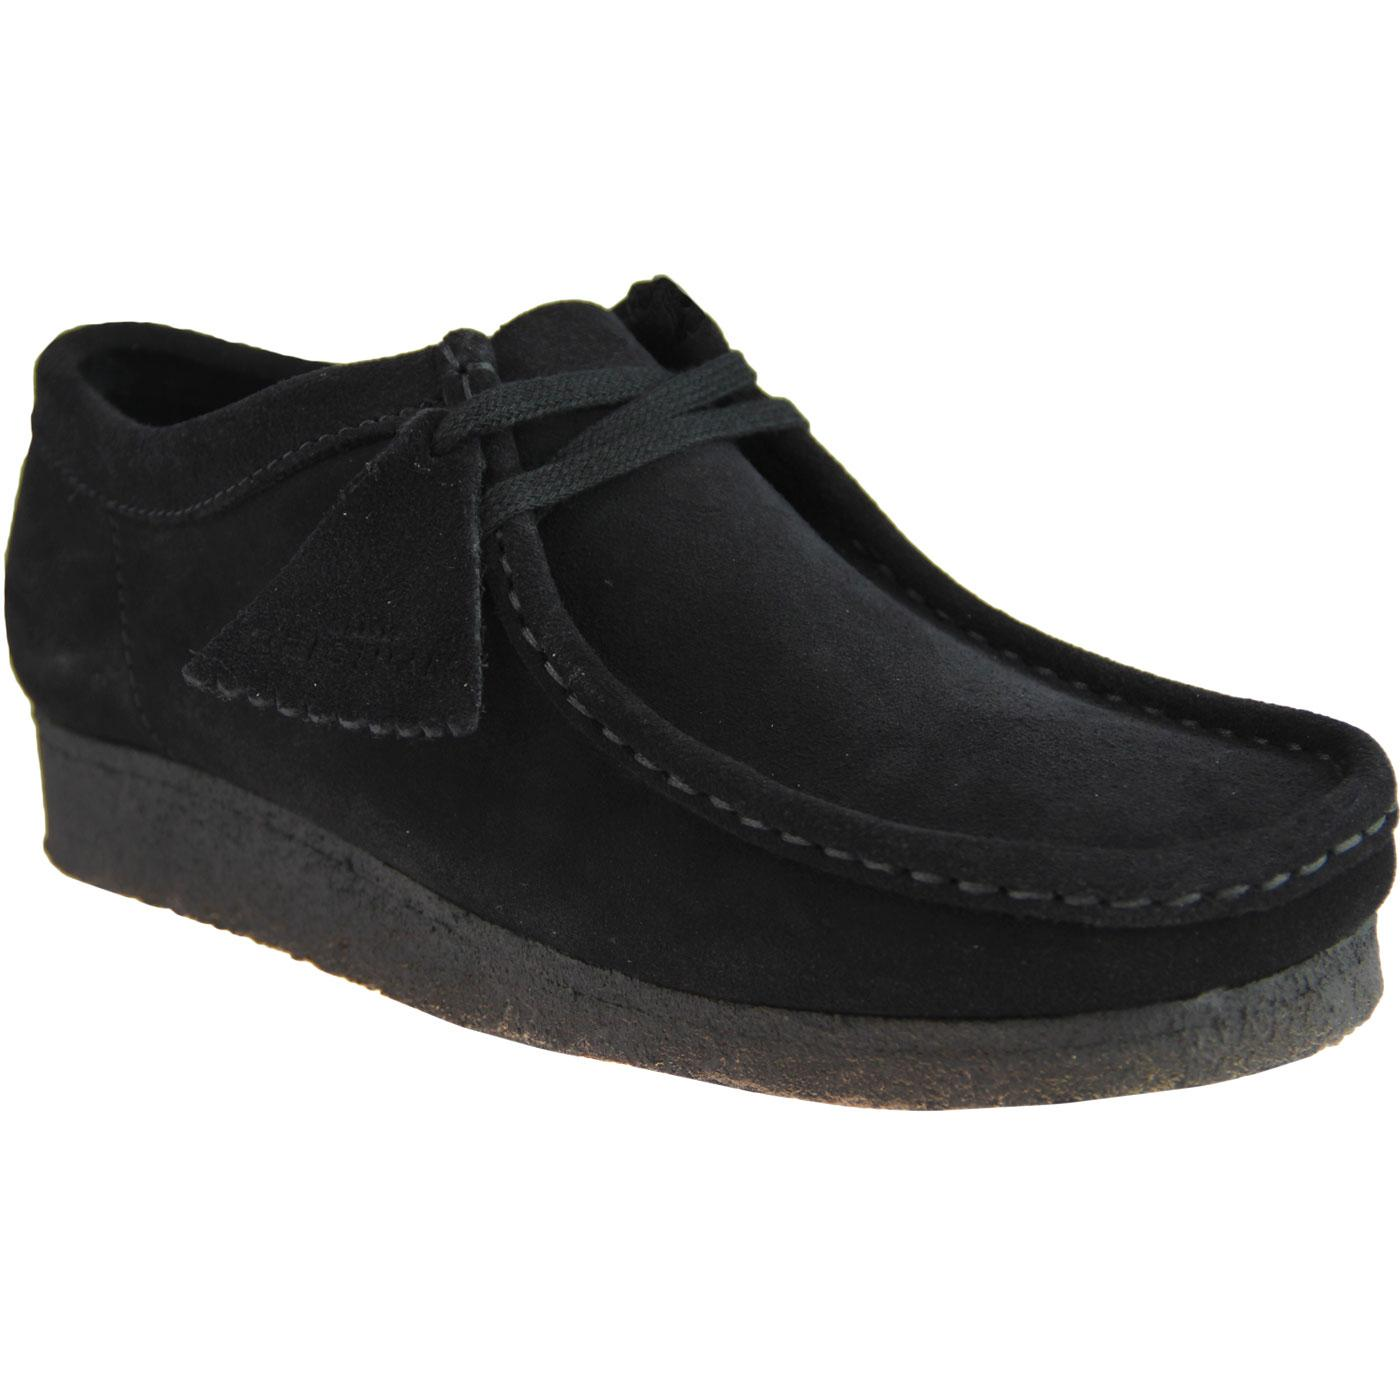 Wallabee CLARKS ORIGINALS Mod Moccasin Shoes Black